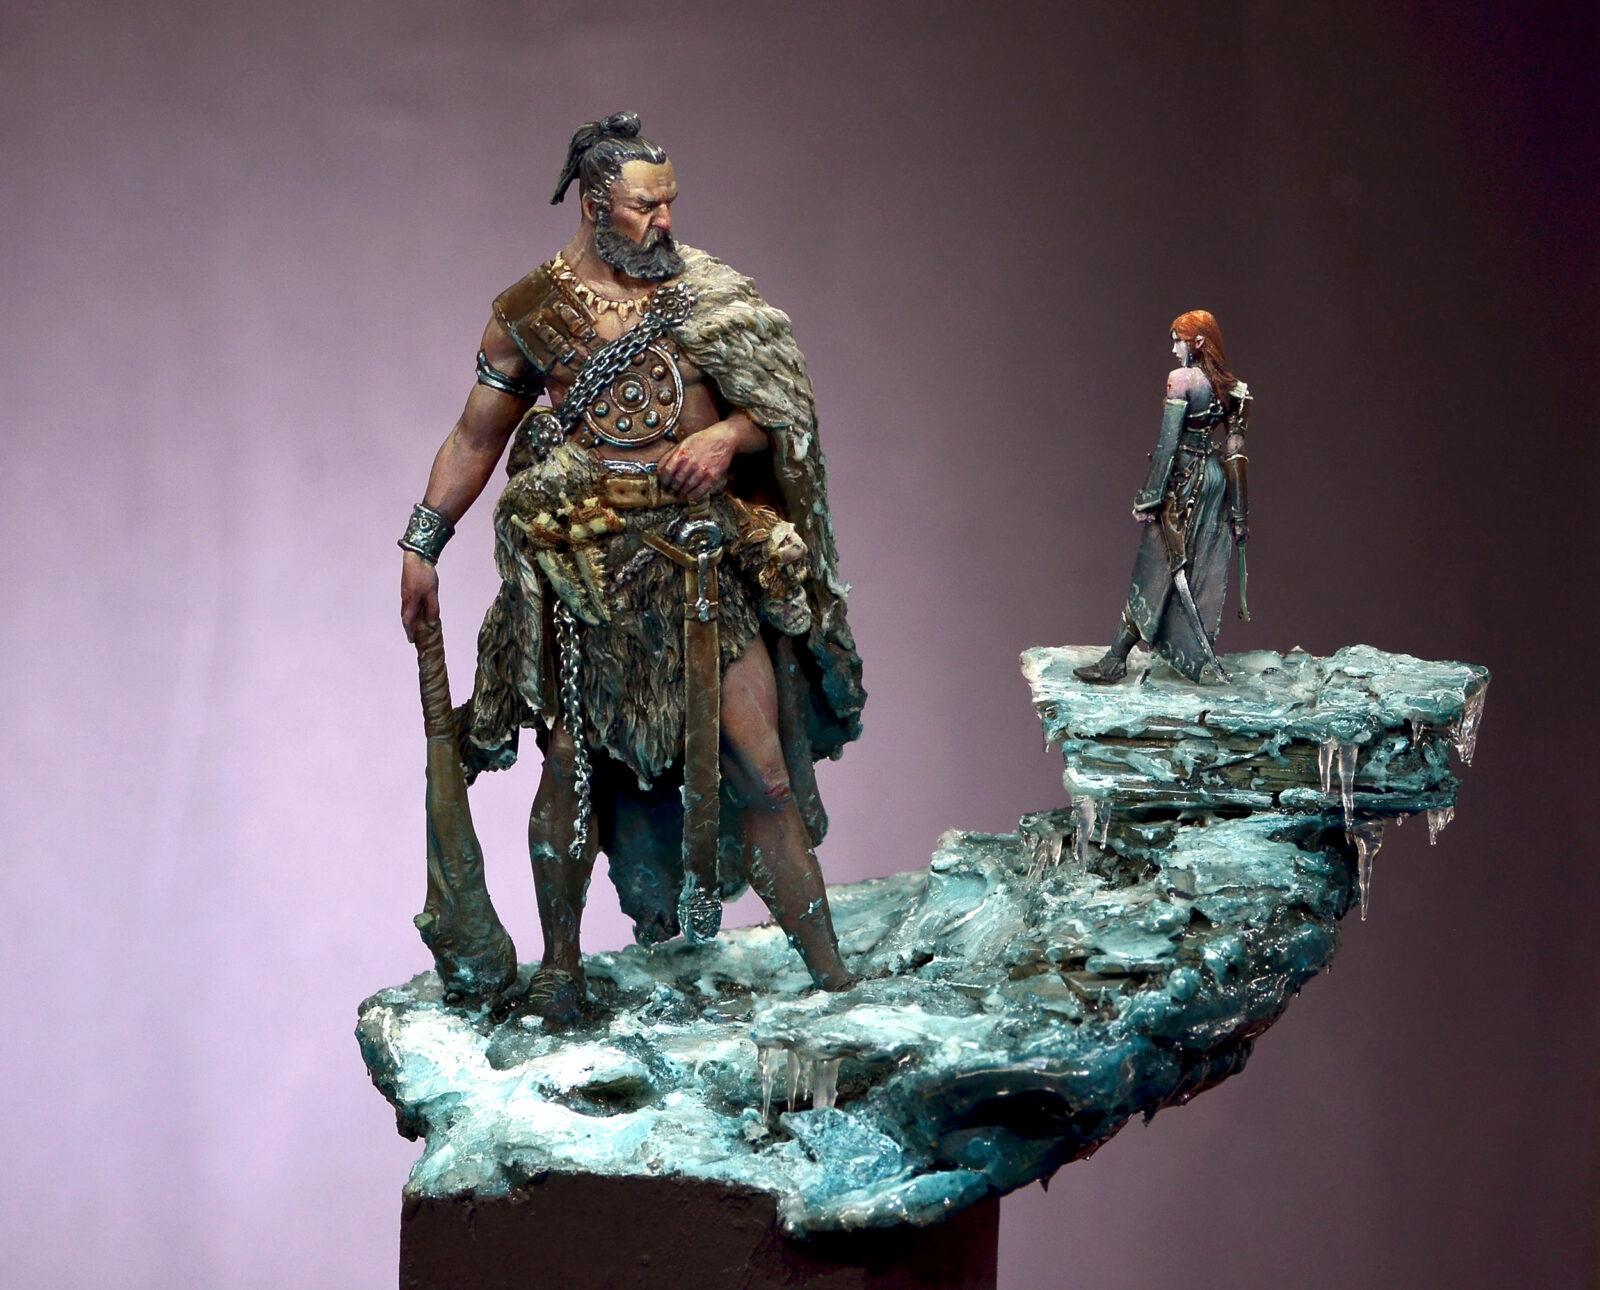 David Goliath03